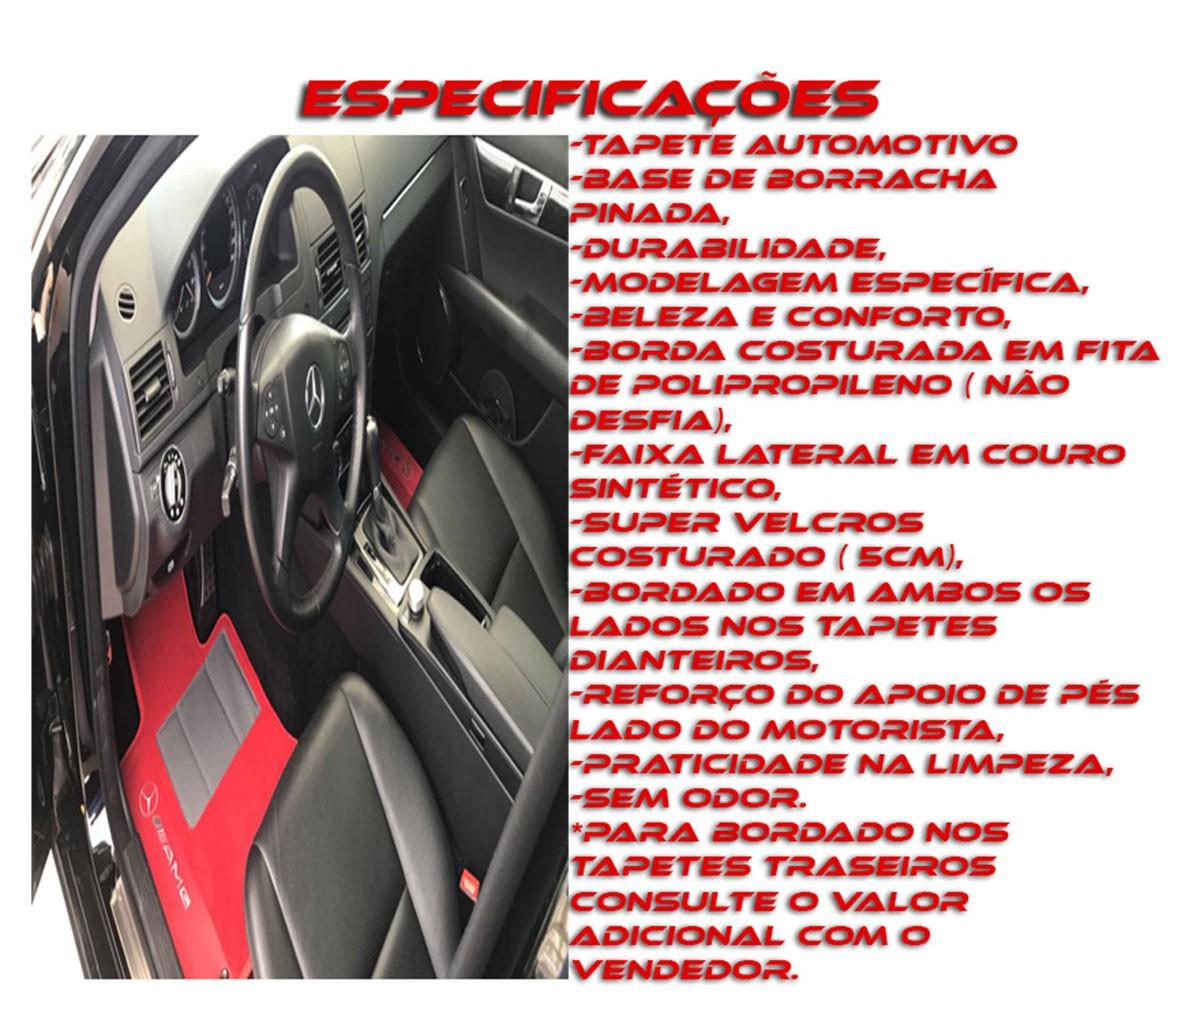 Tapete Bmw Serie5 525, 539, 540 Carpete Premium